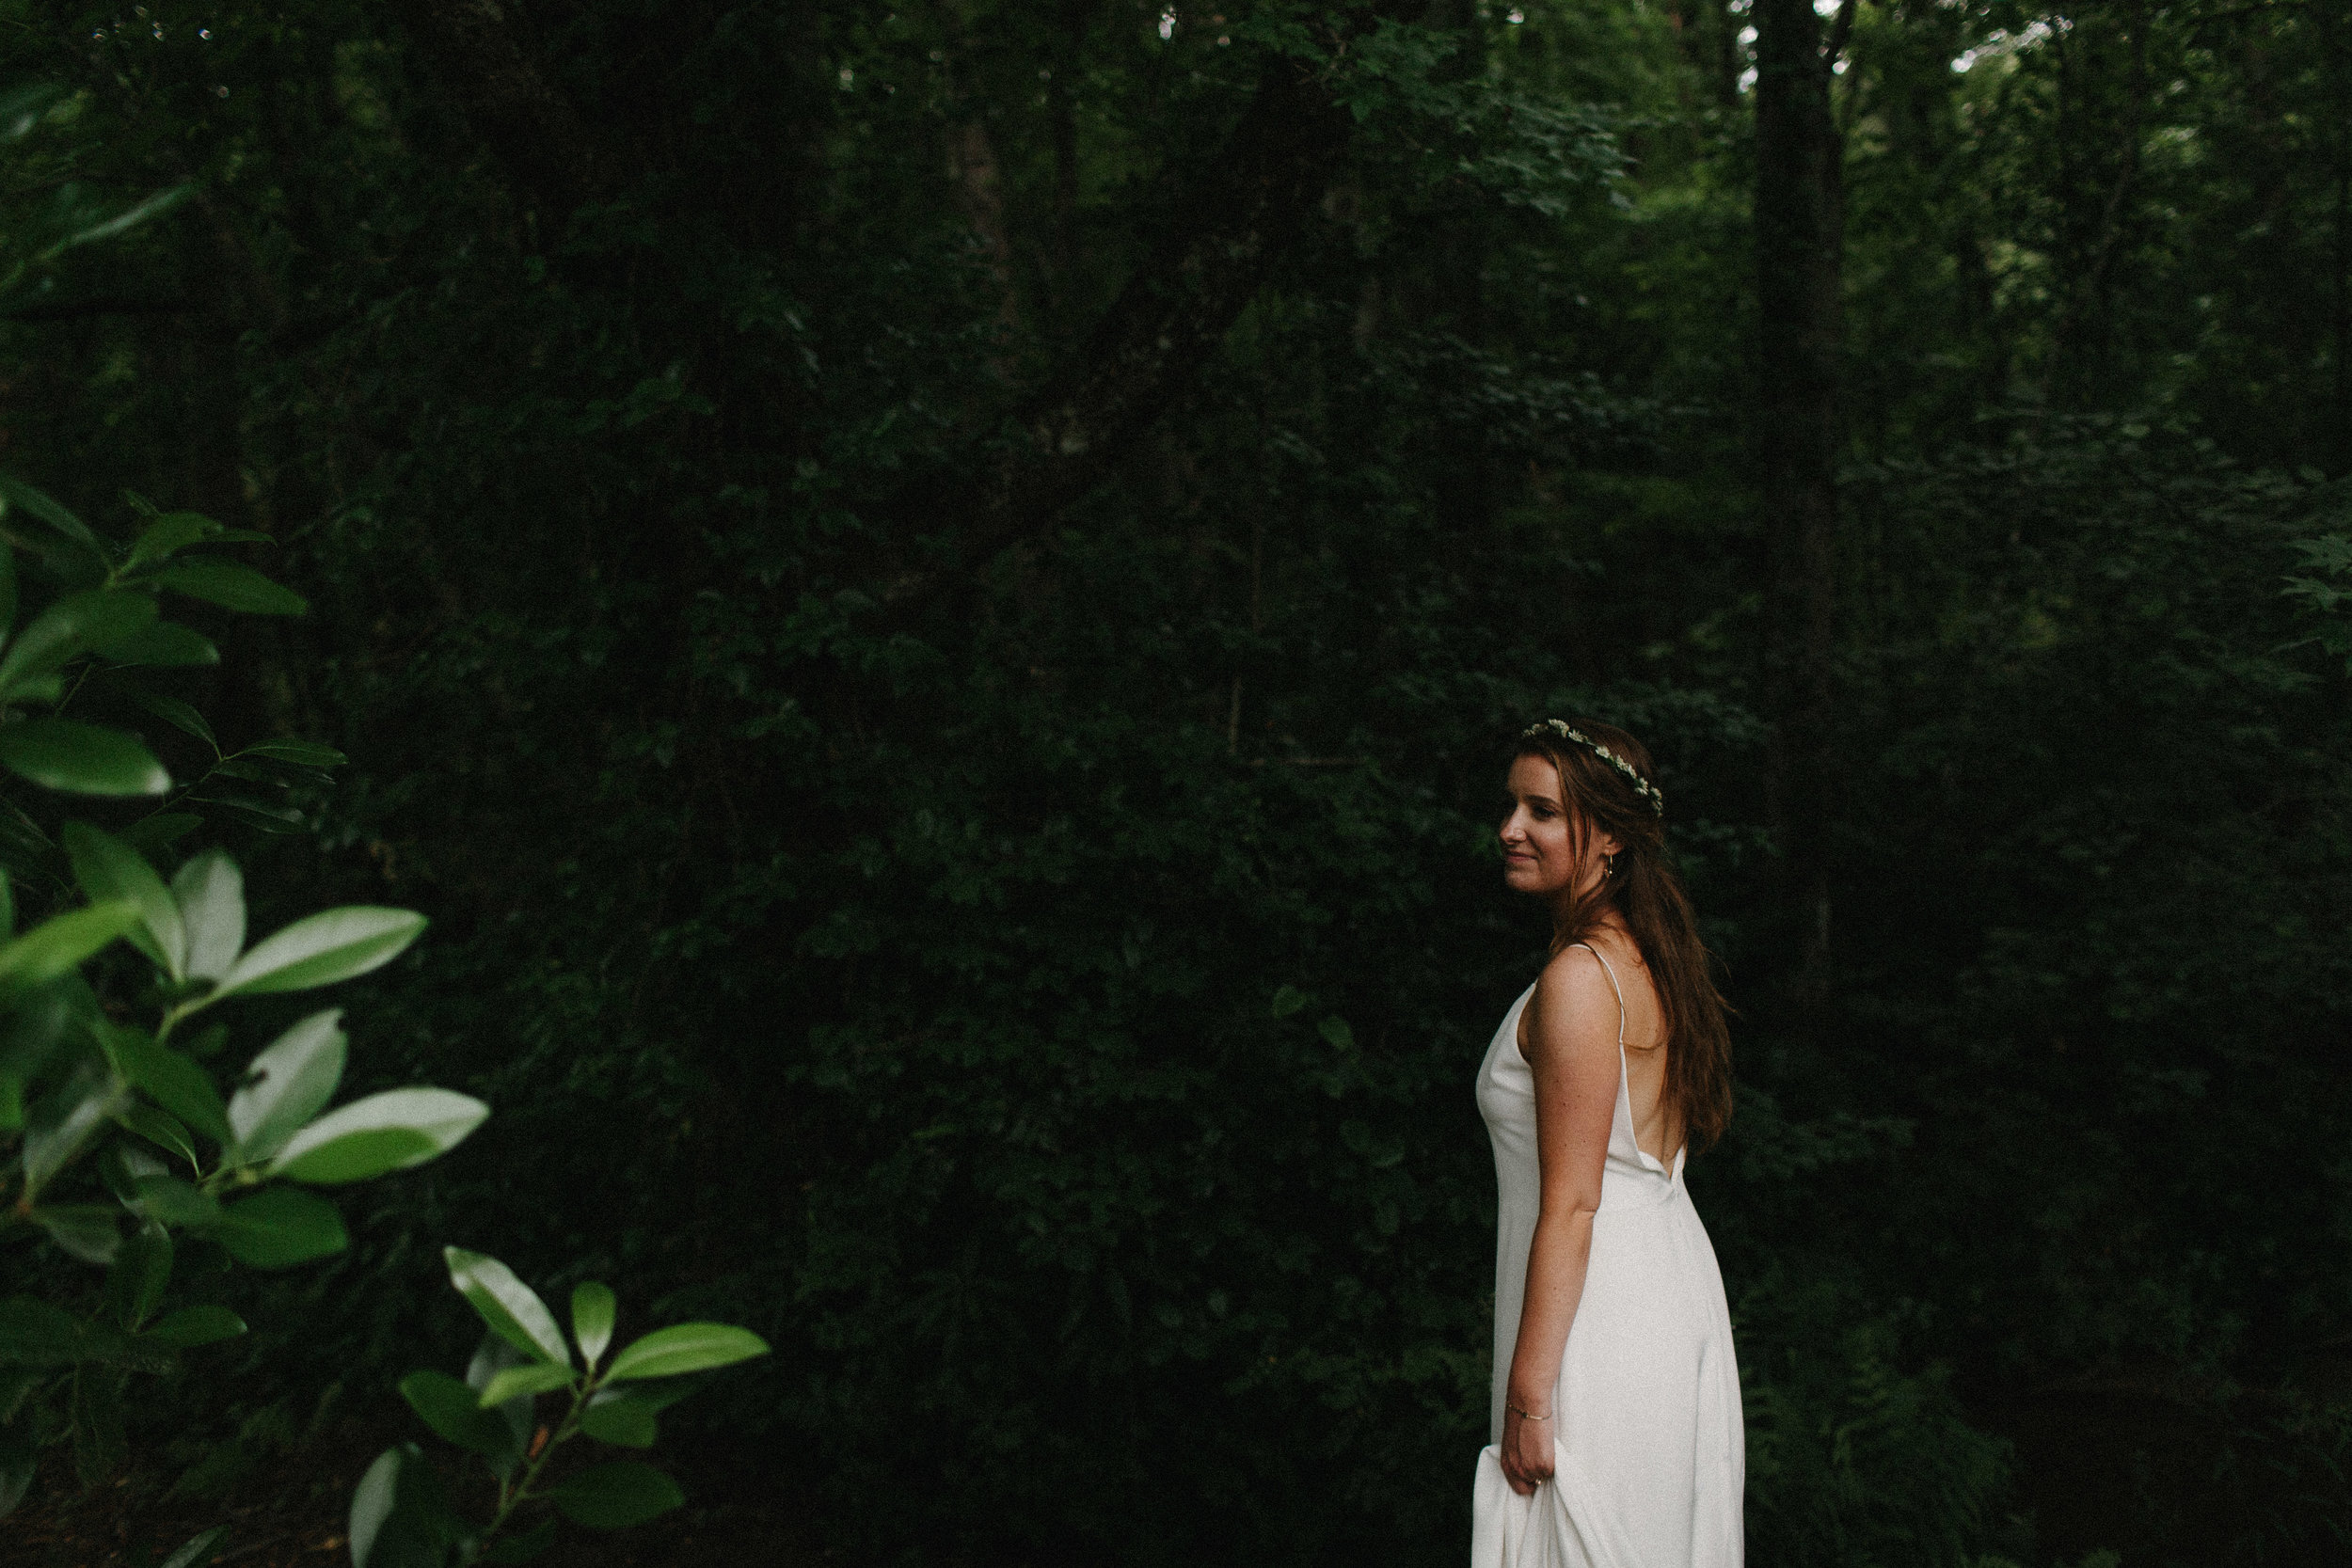 glen_ella_meadow_creekside_atlanta_wedding_photographers_1863.jpg